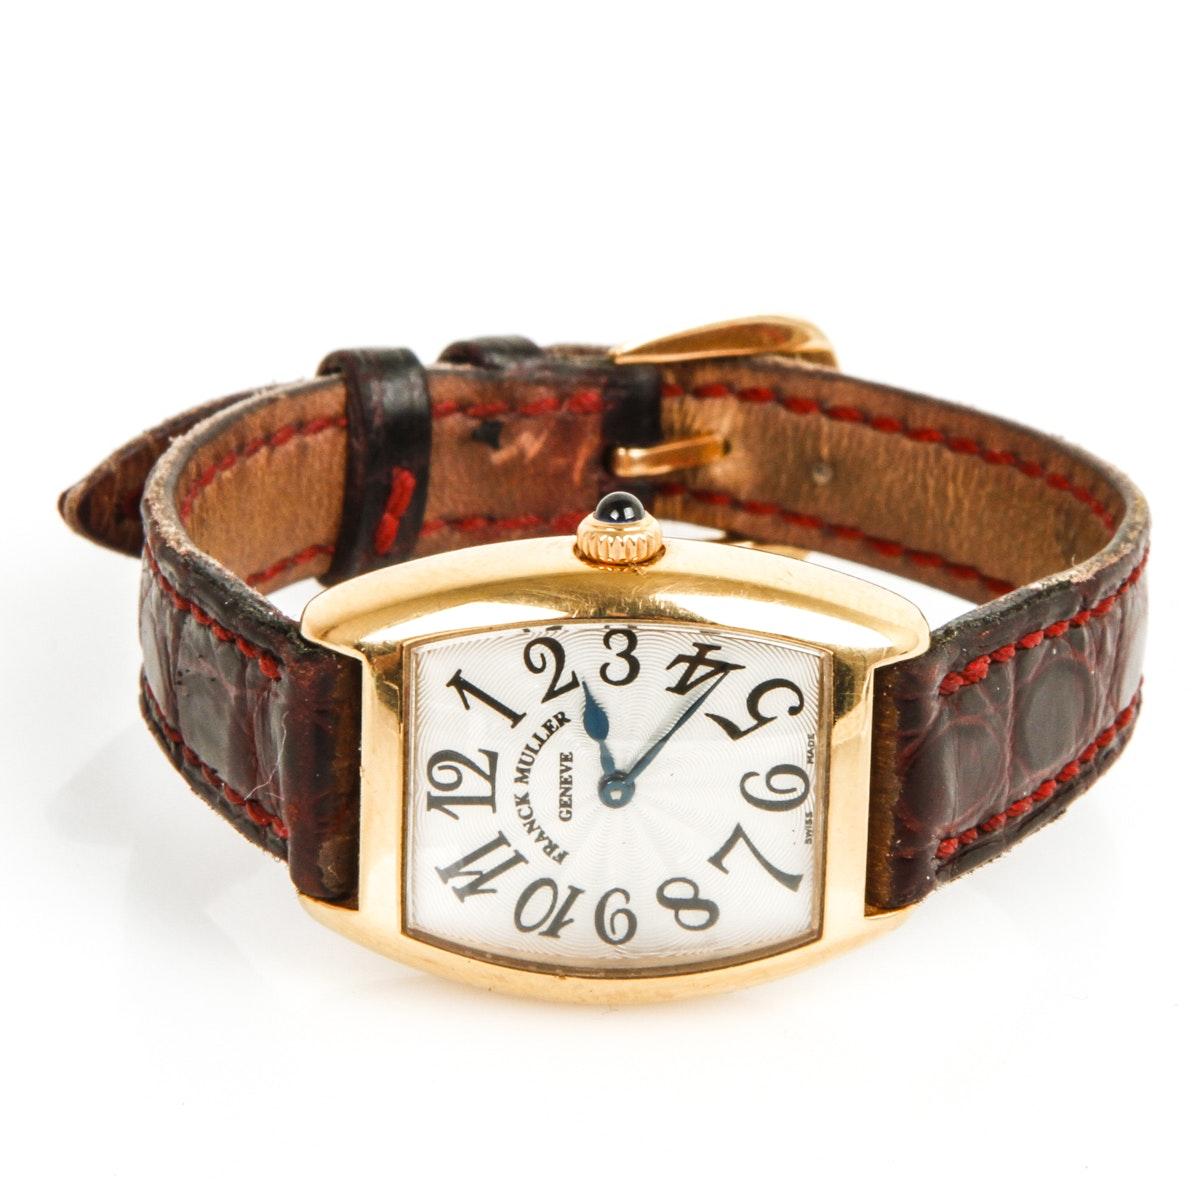 Franck Muller 18K Yellow Gold Geneve Wristwatch